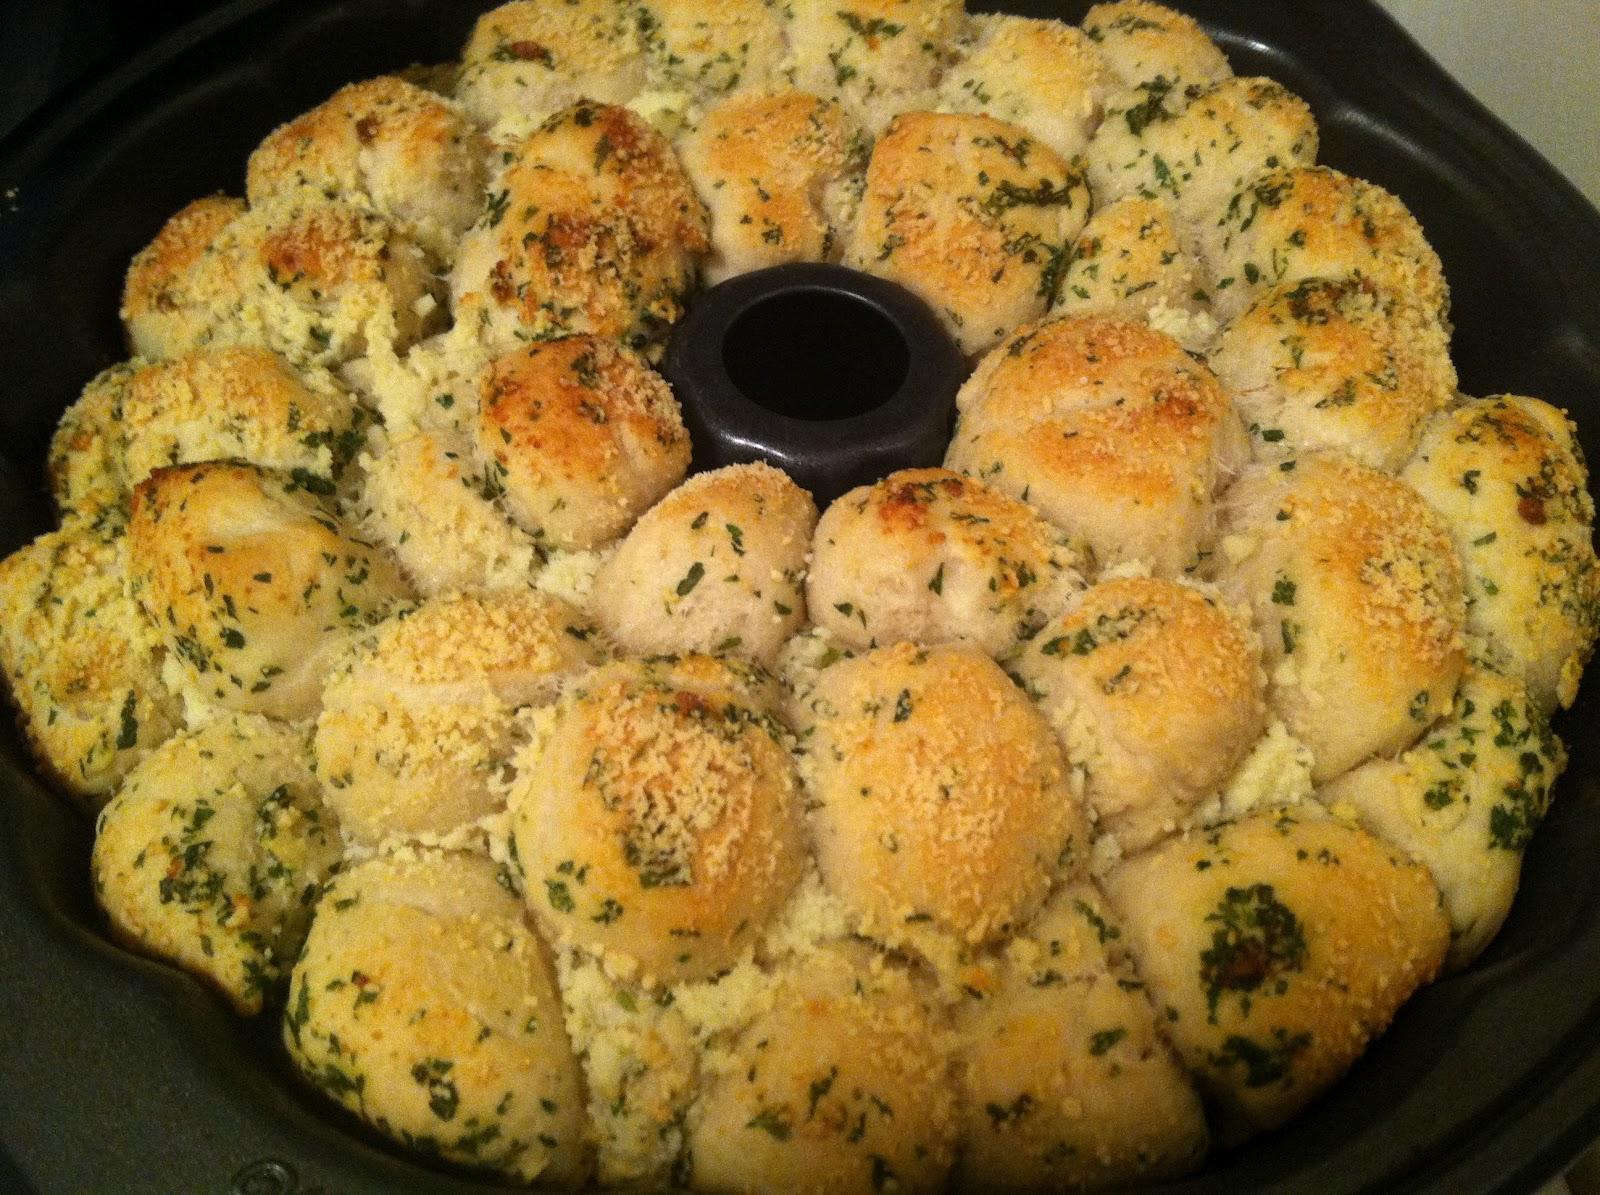 Julie Bakes: Garlic parmesan pull-apart bread